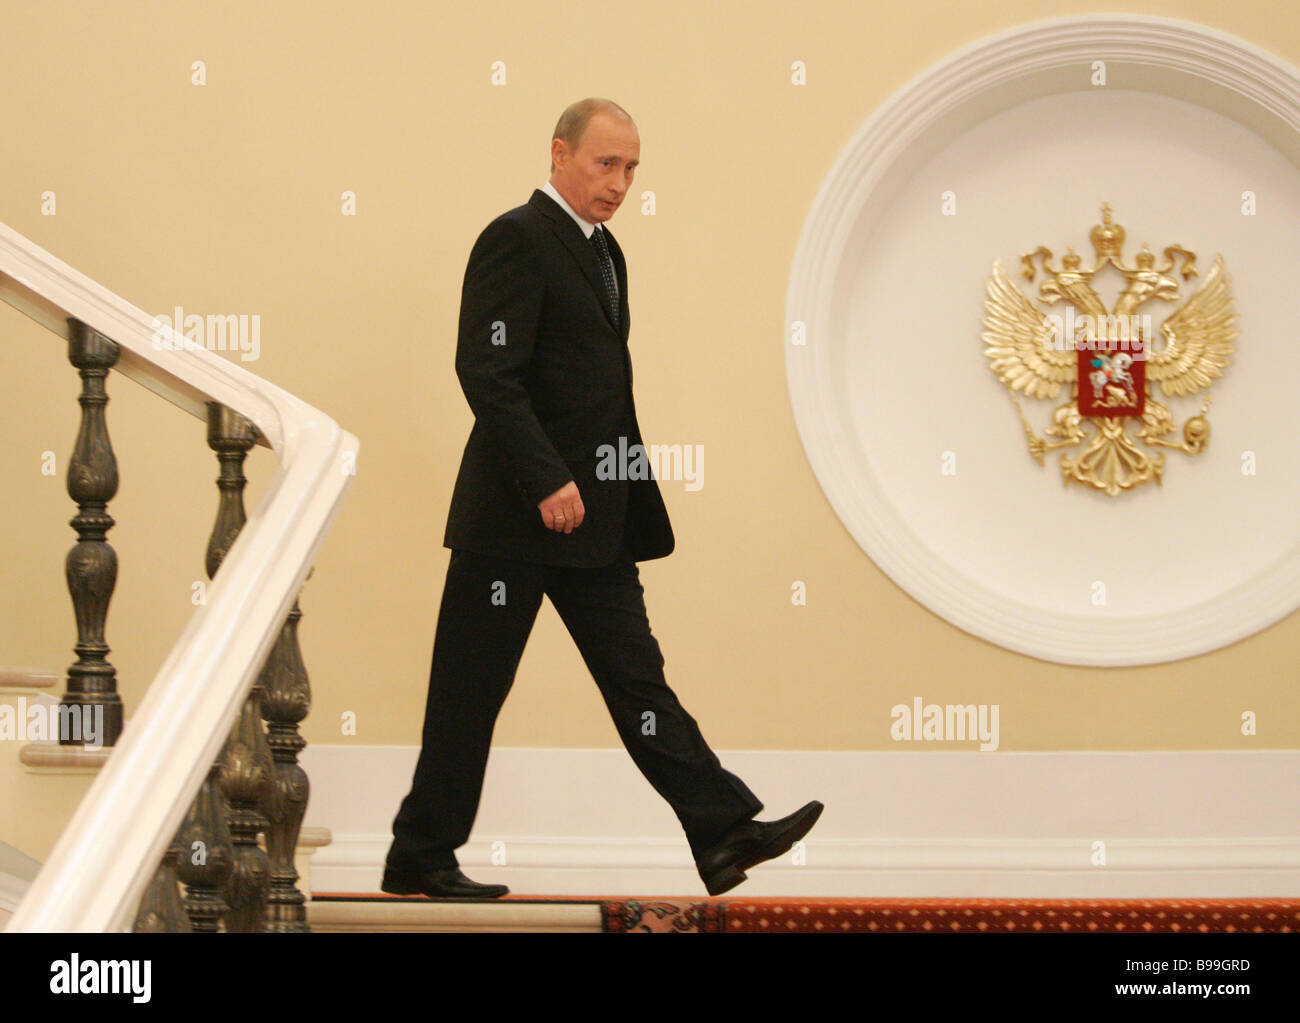 Vladimir Putin President of Russia in the Kremlin - Stock Image